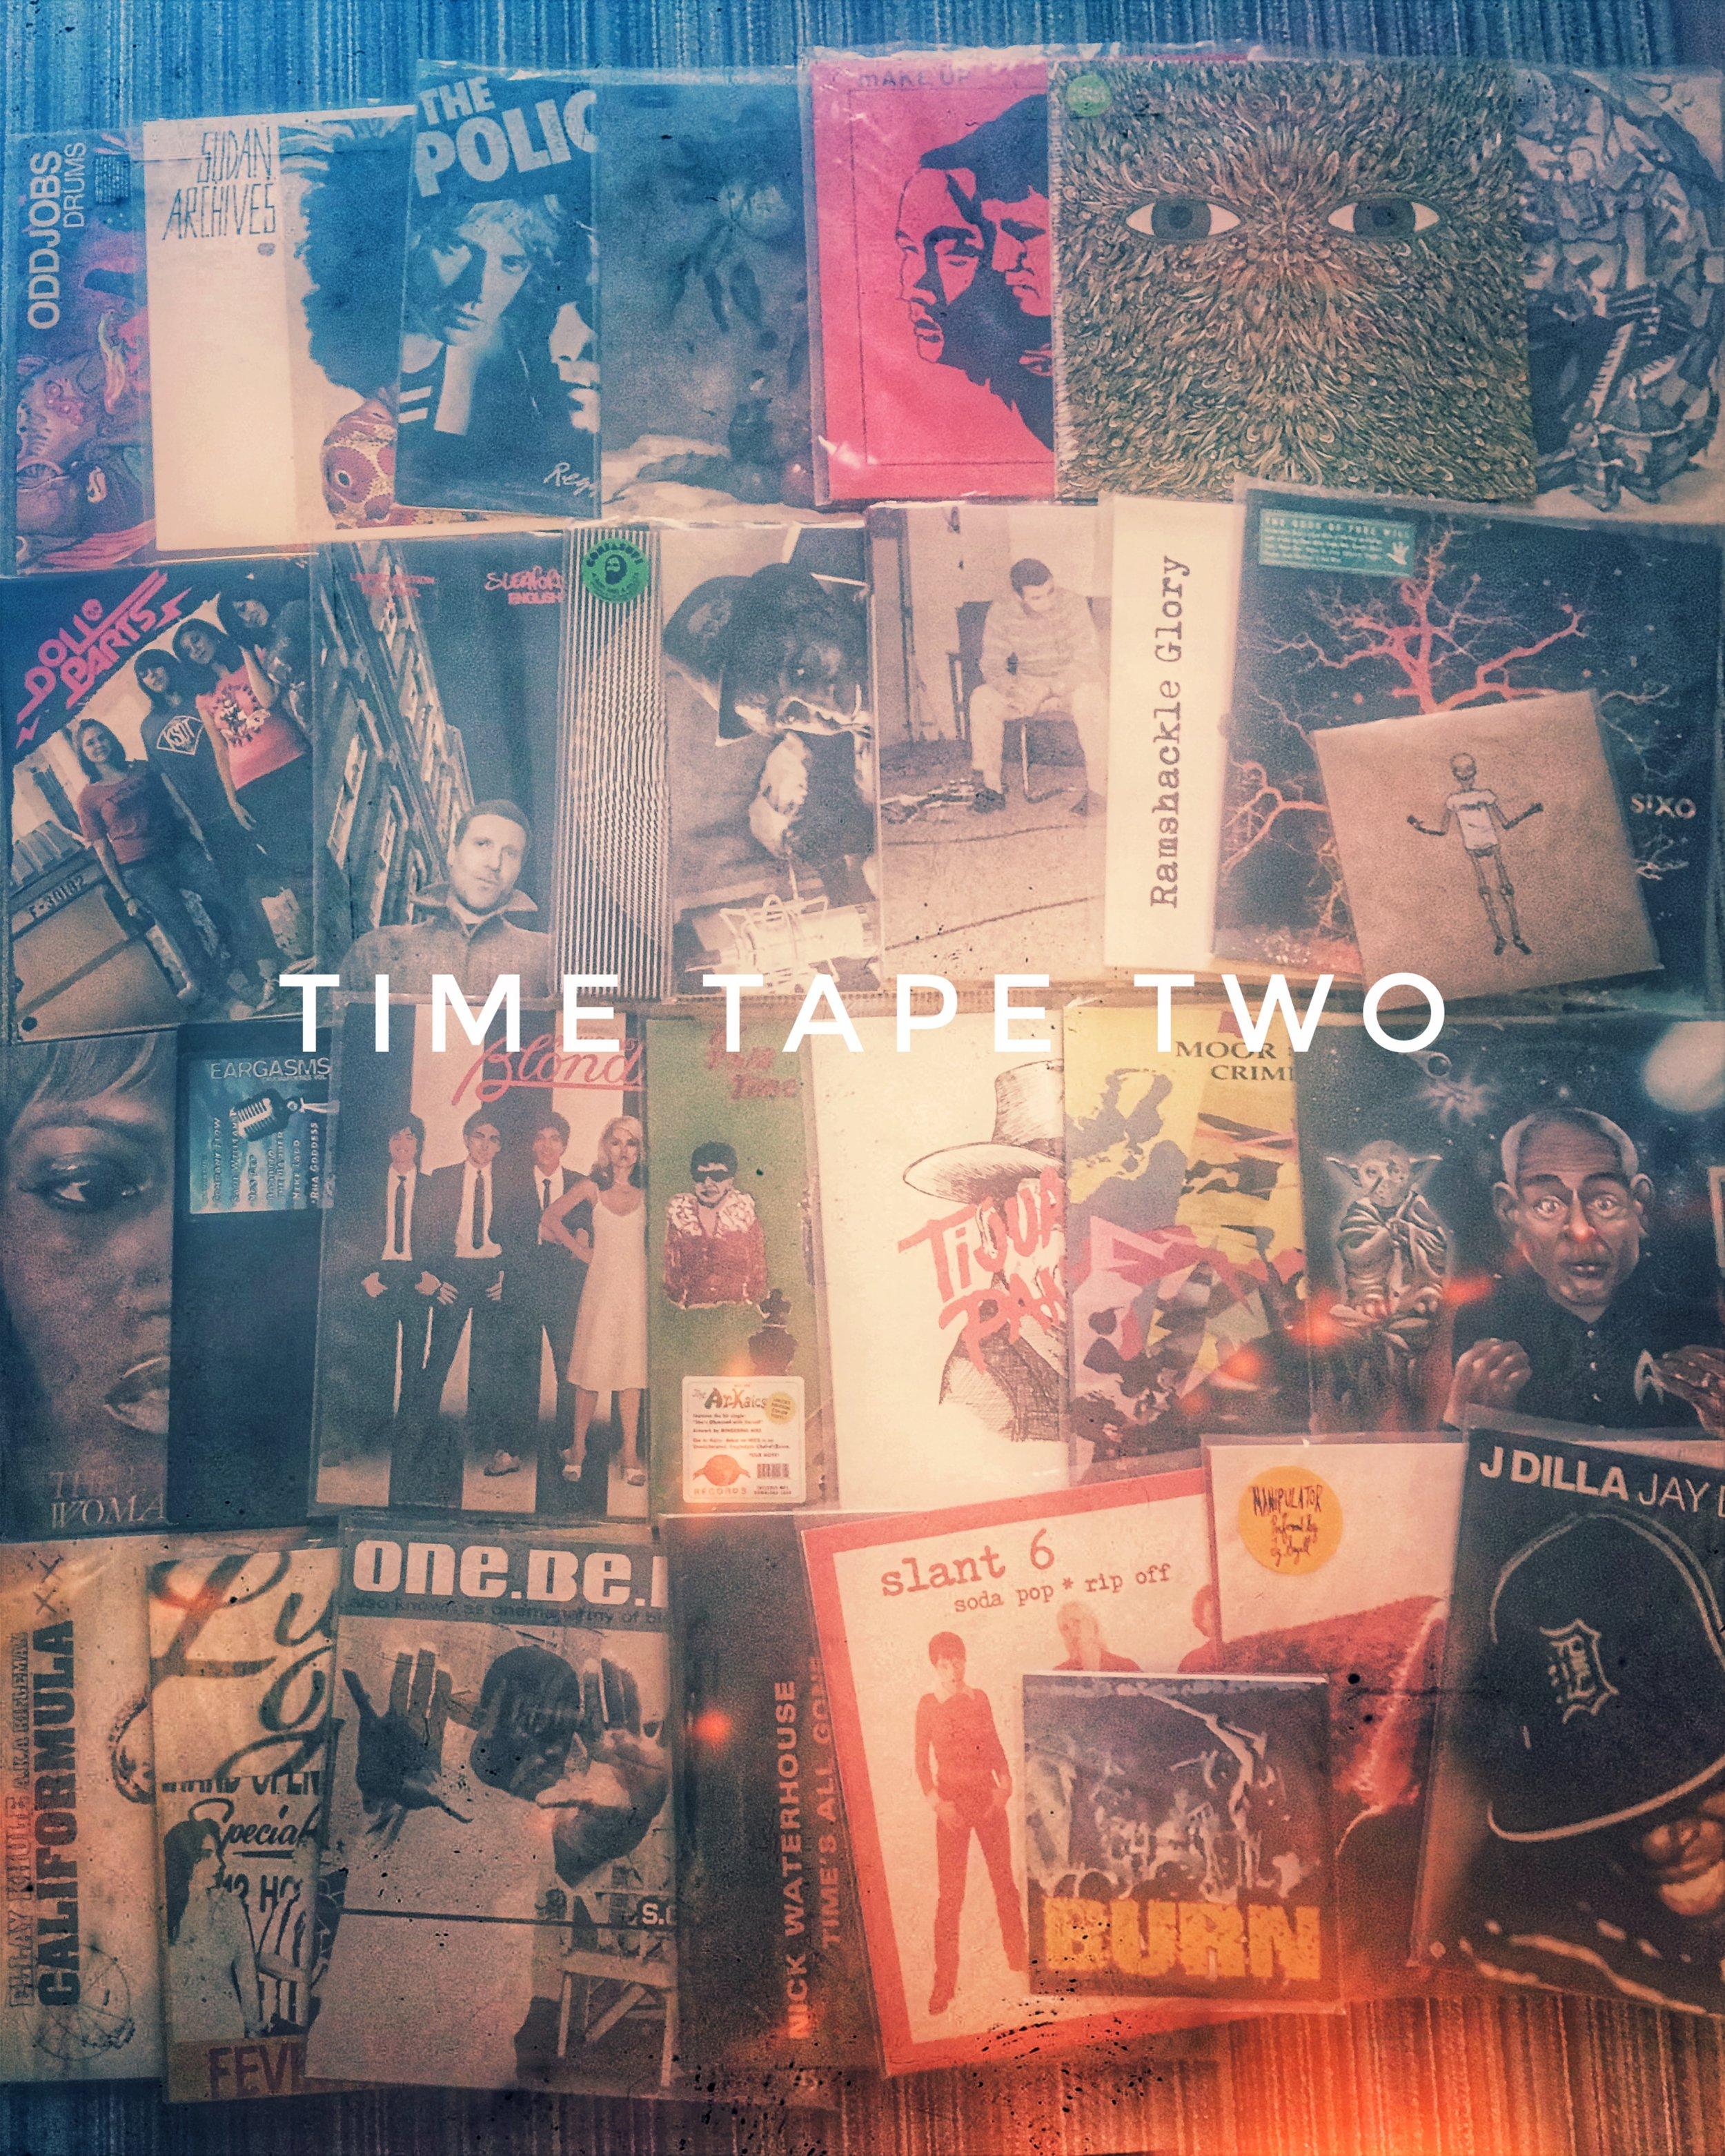 timetapetwo cover image.jpg